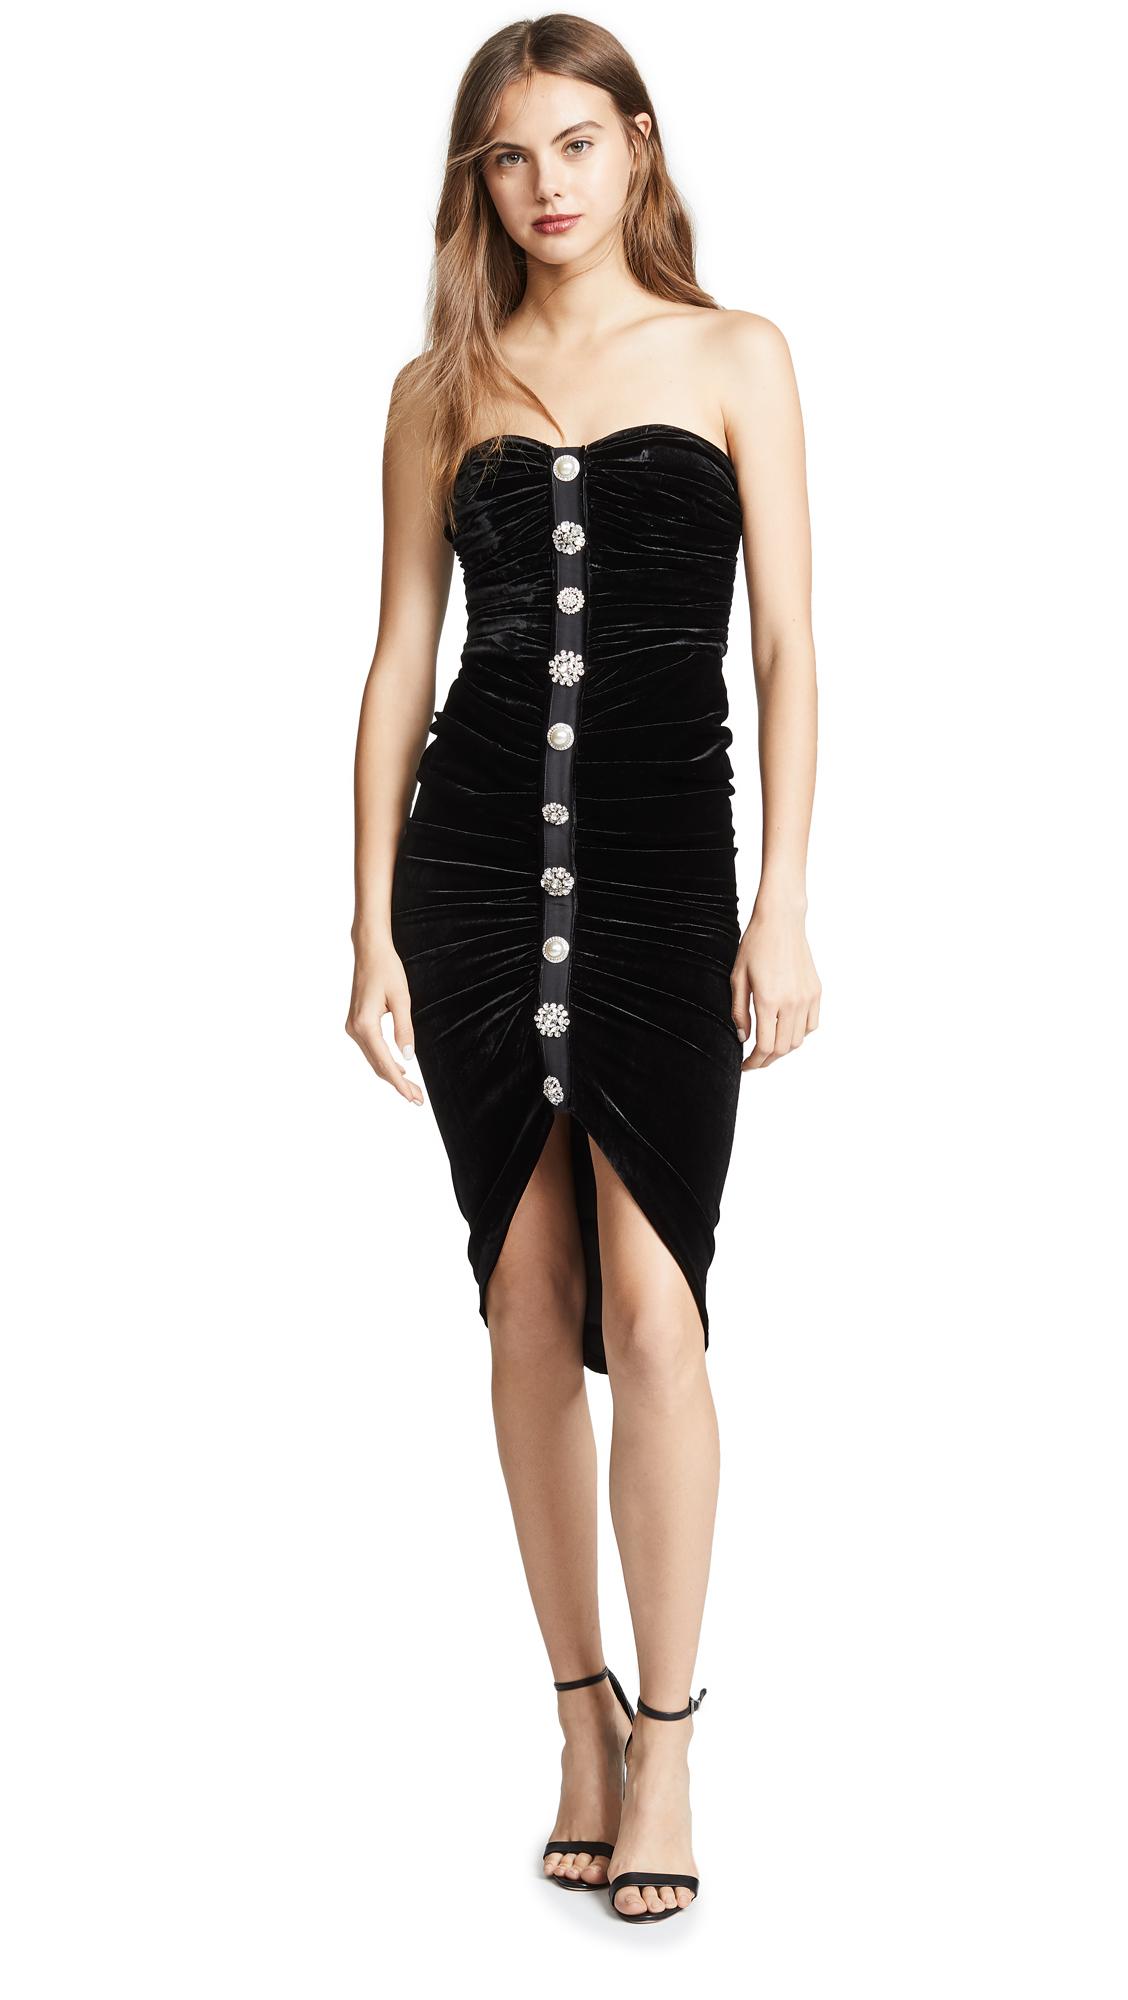 Veronica Beard Palo Dress - Black